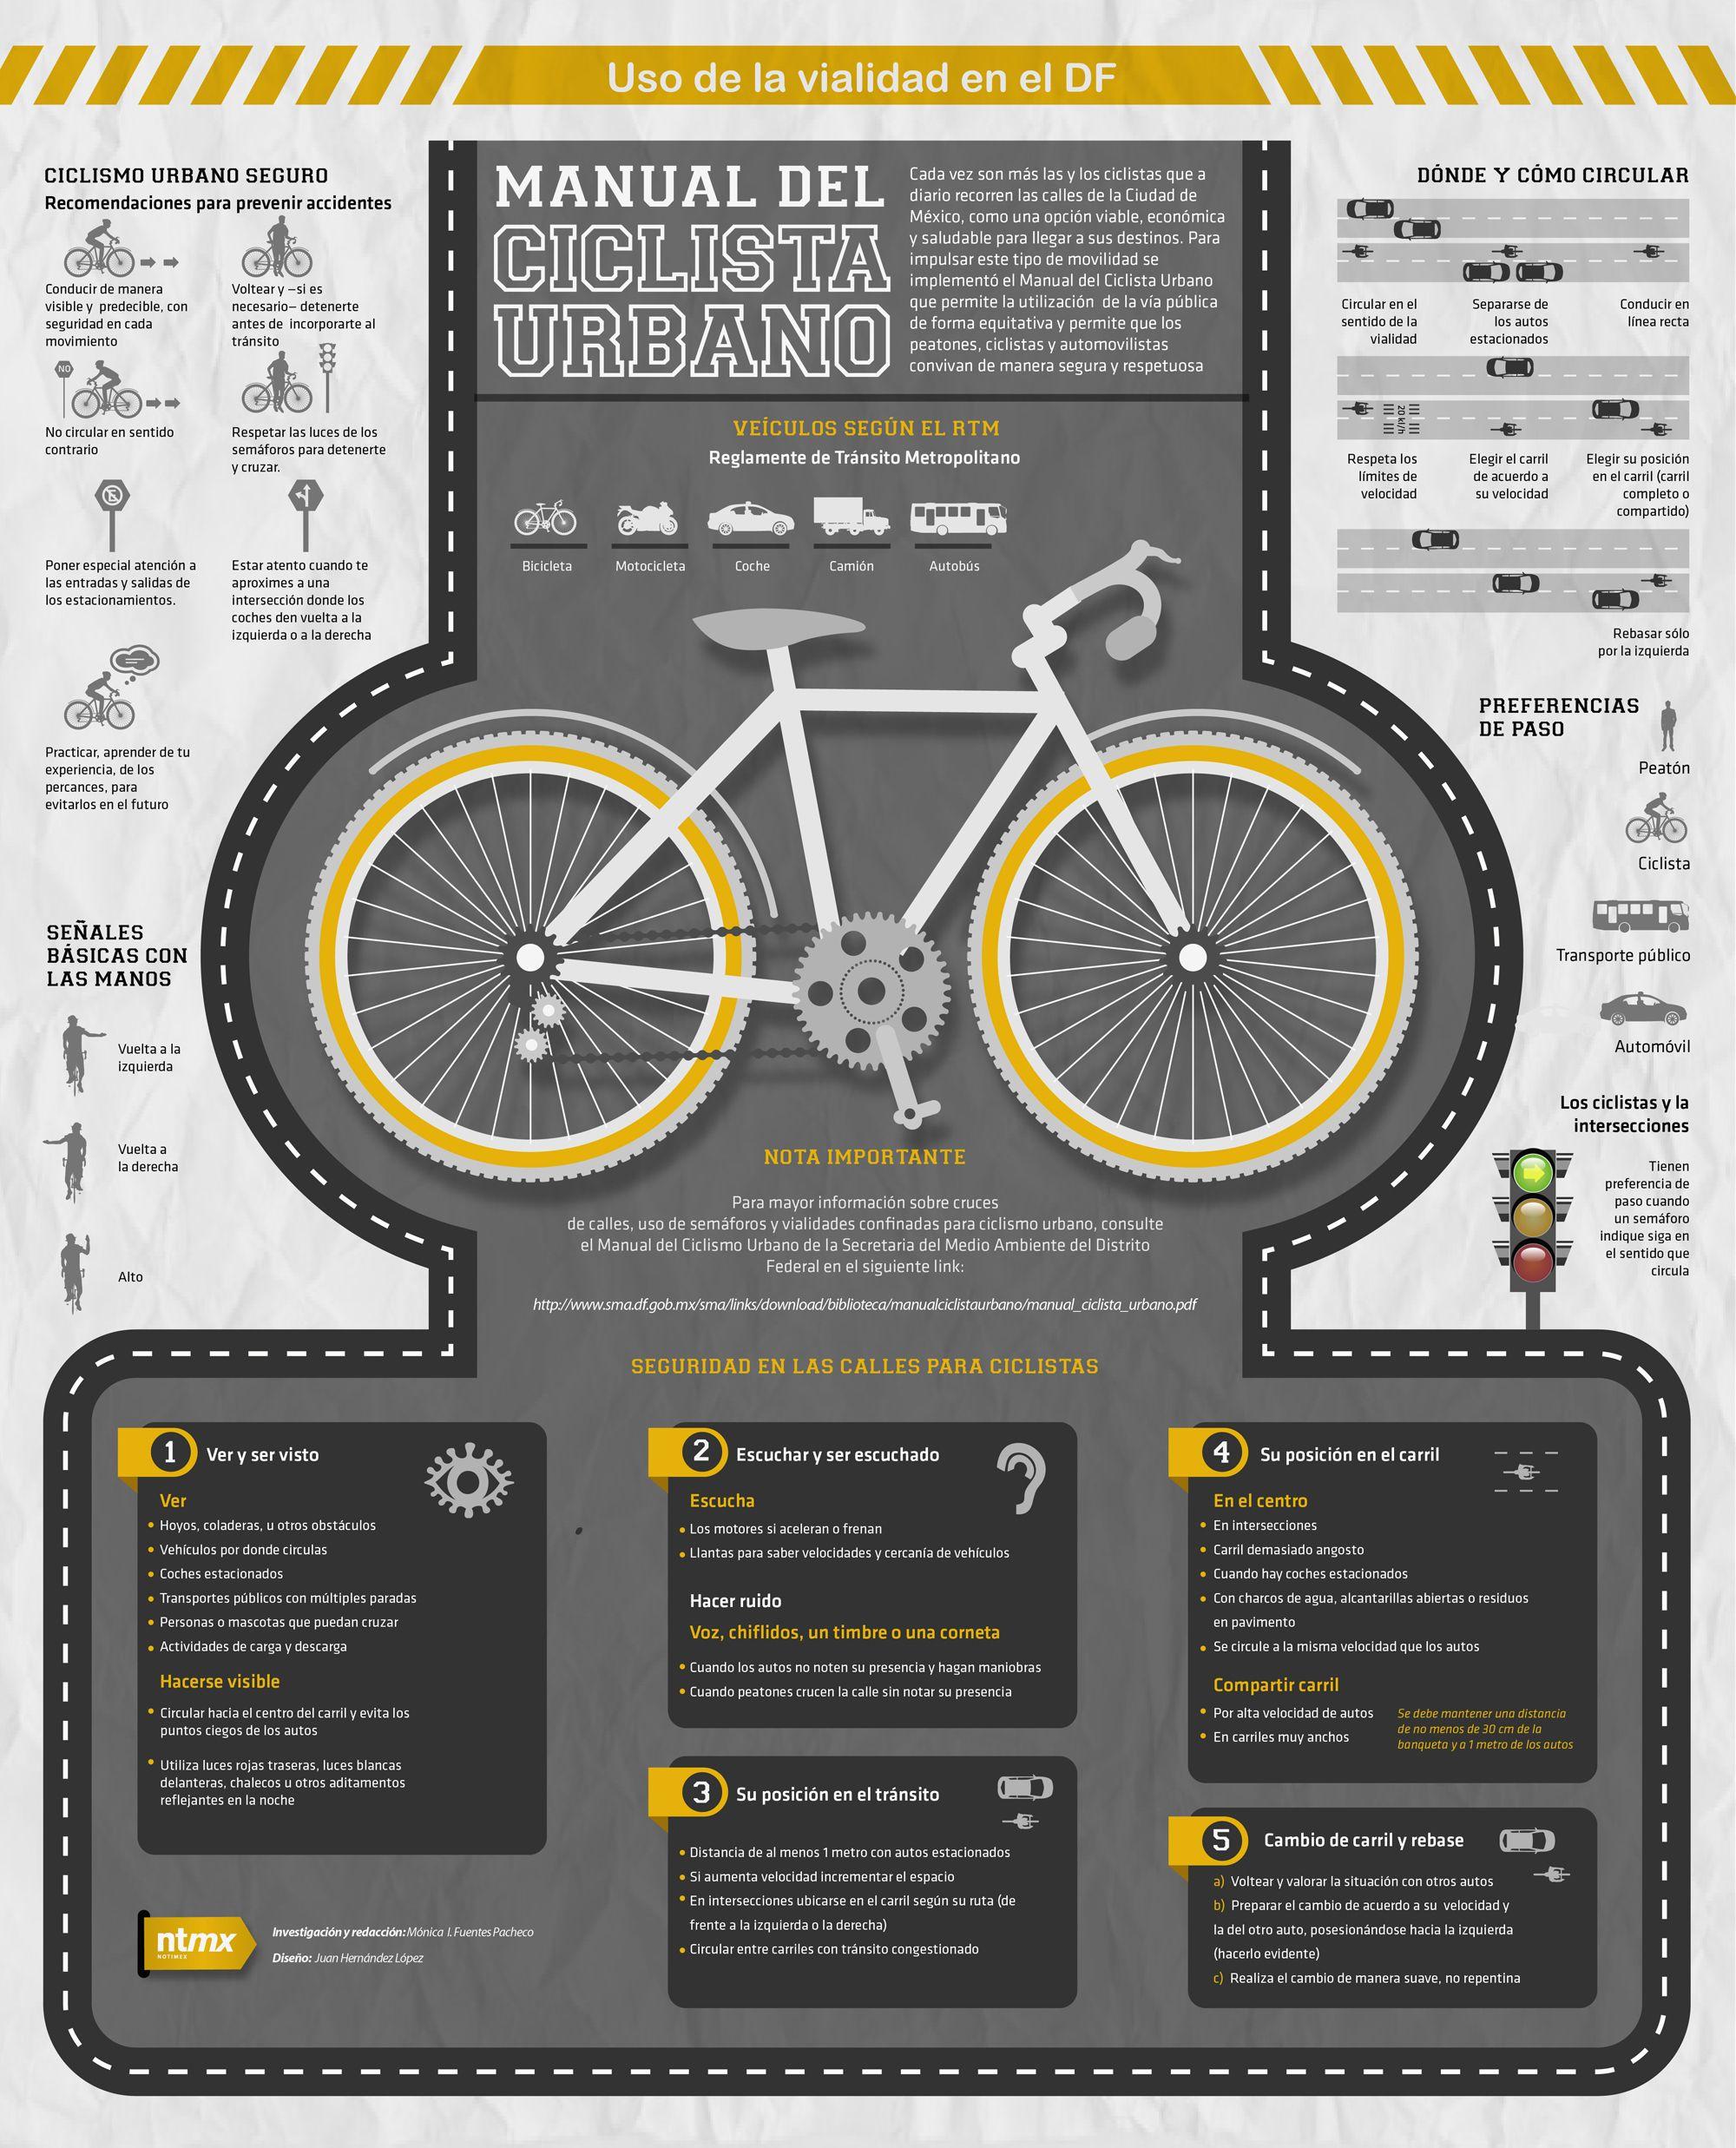 Breve Manual Del Ciclista Urbano Ciclista Urbano Ciclismo Urbano Consejos De Ciclismo